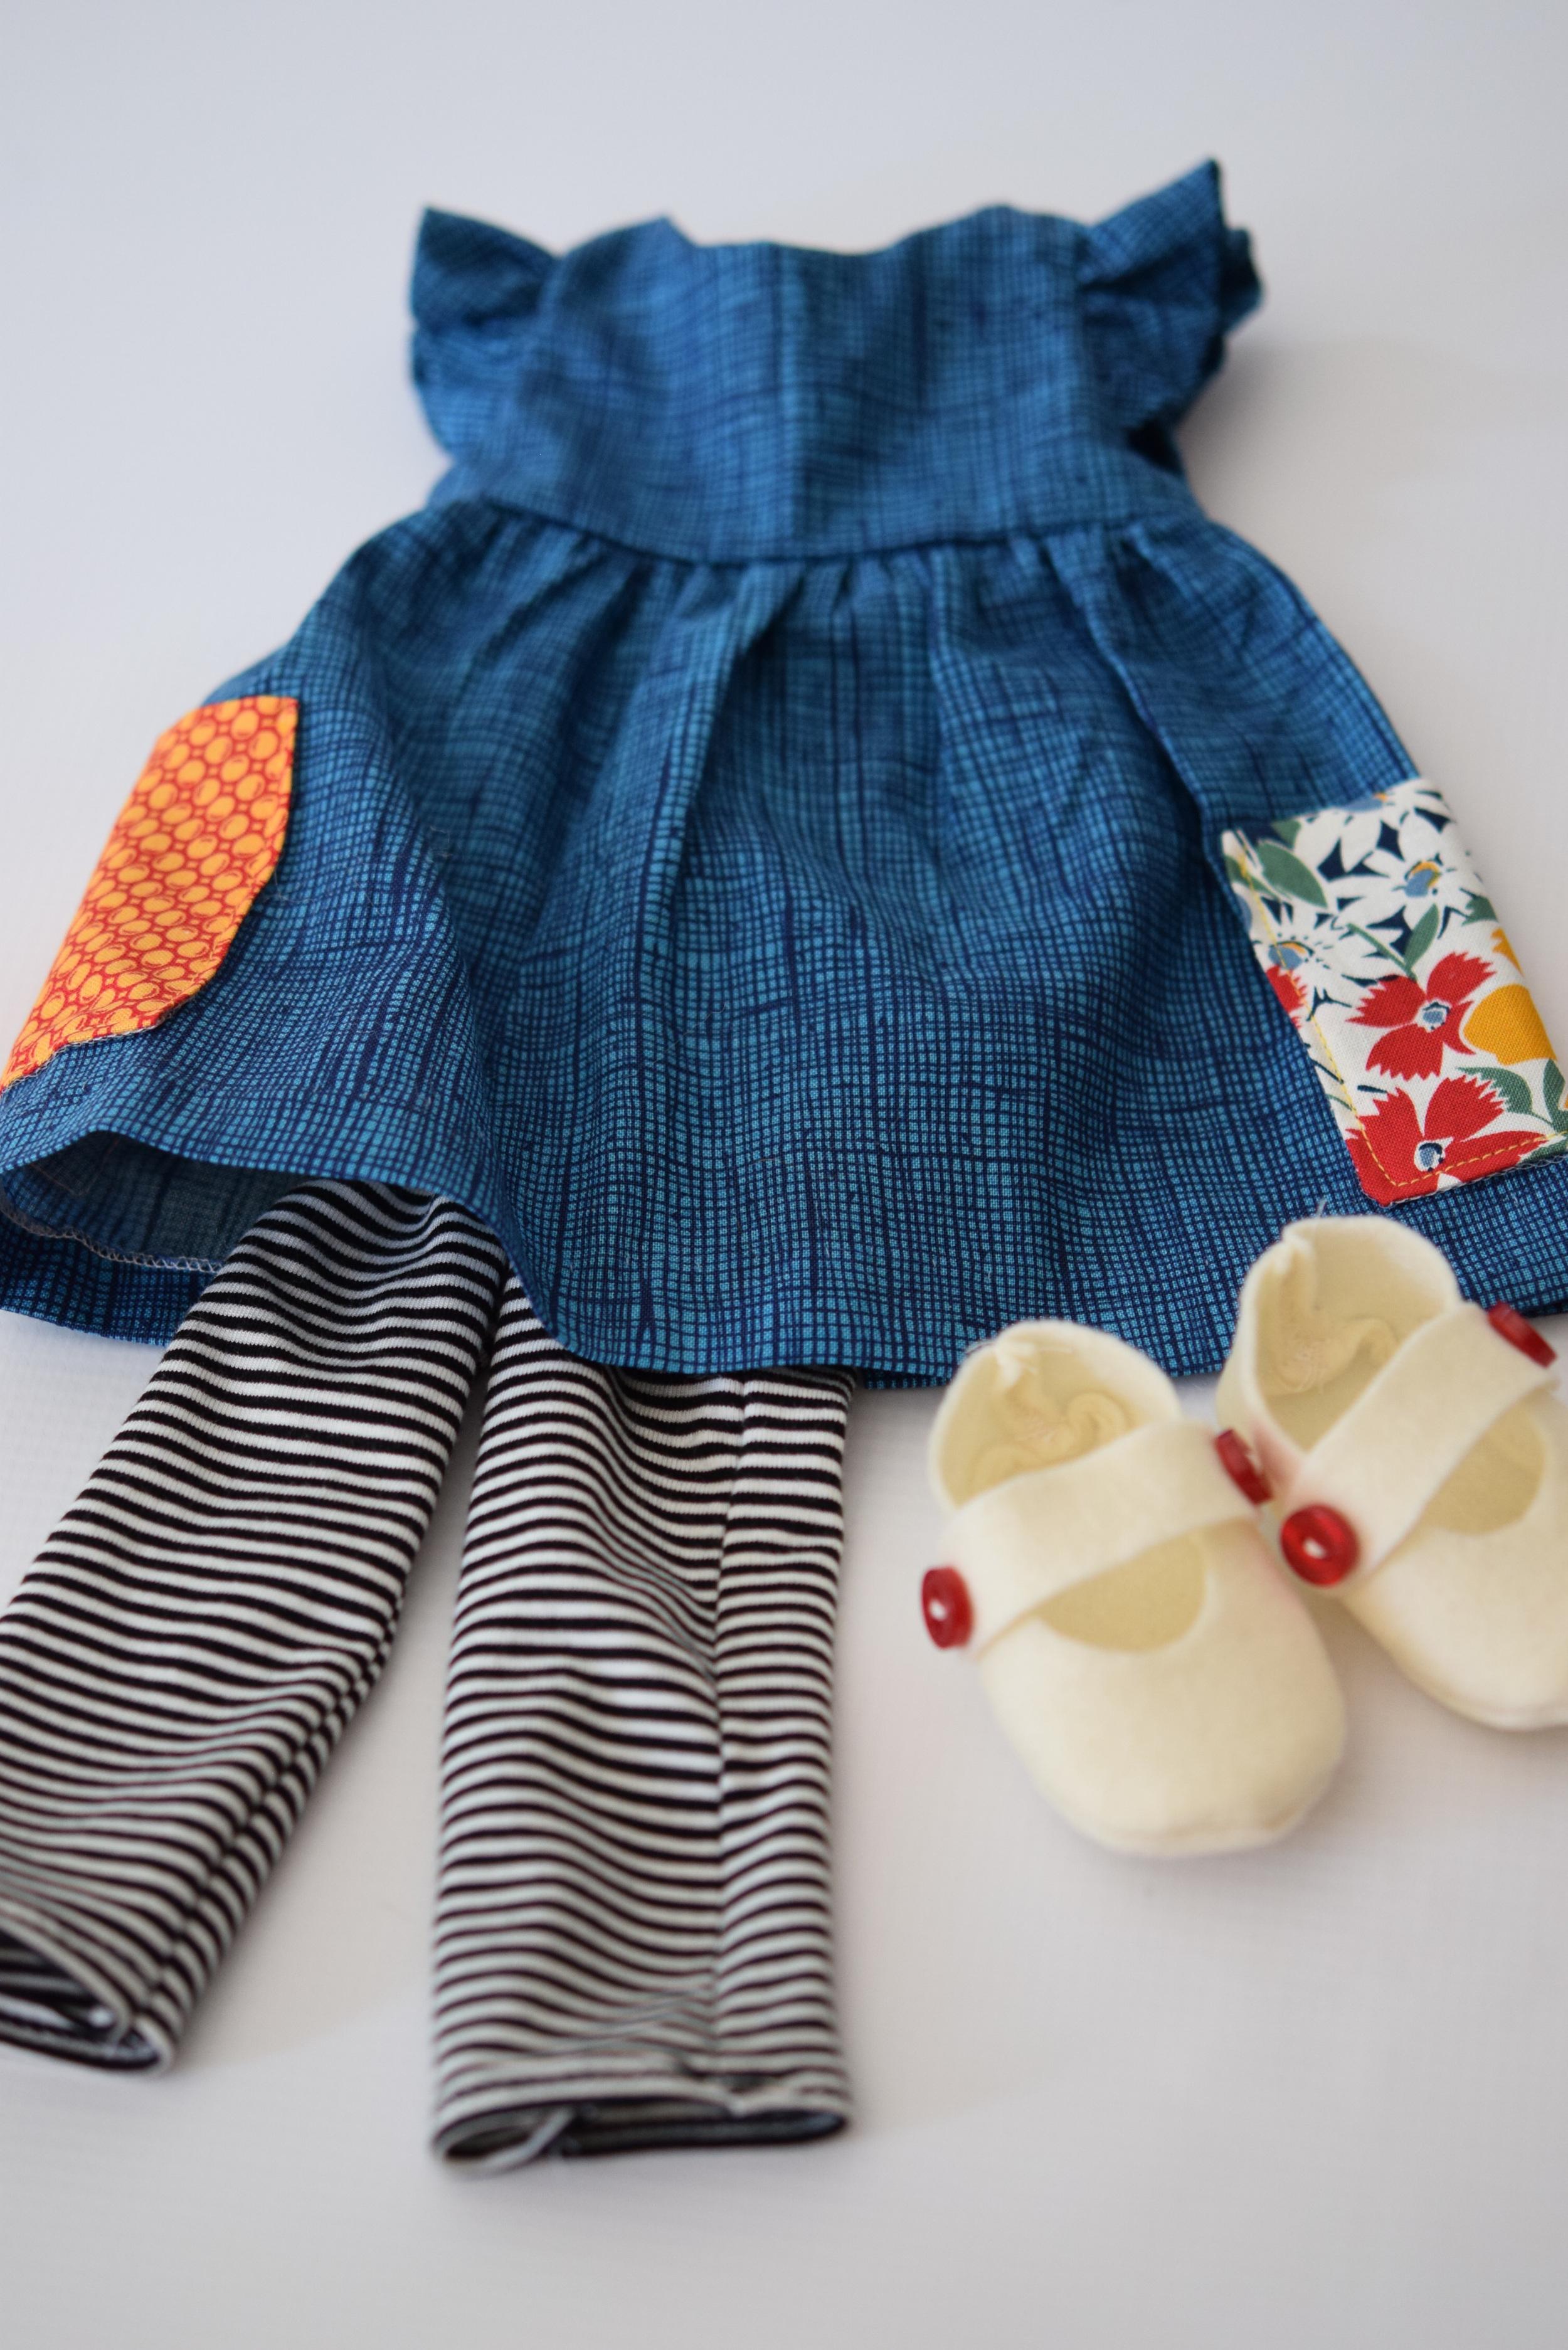 Crosshatch Play dress